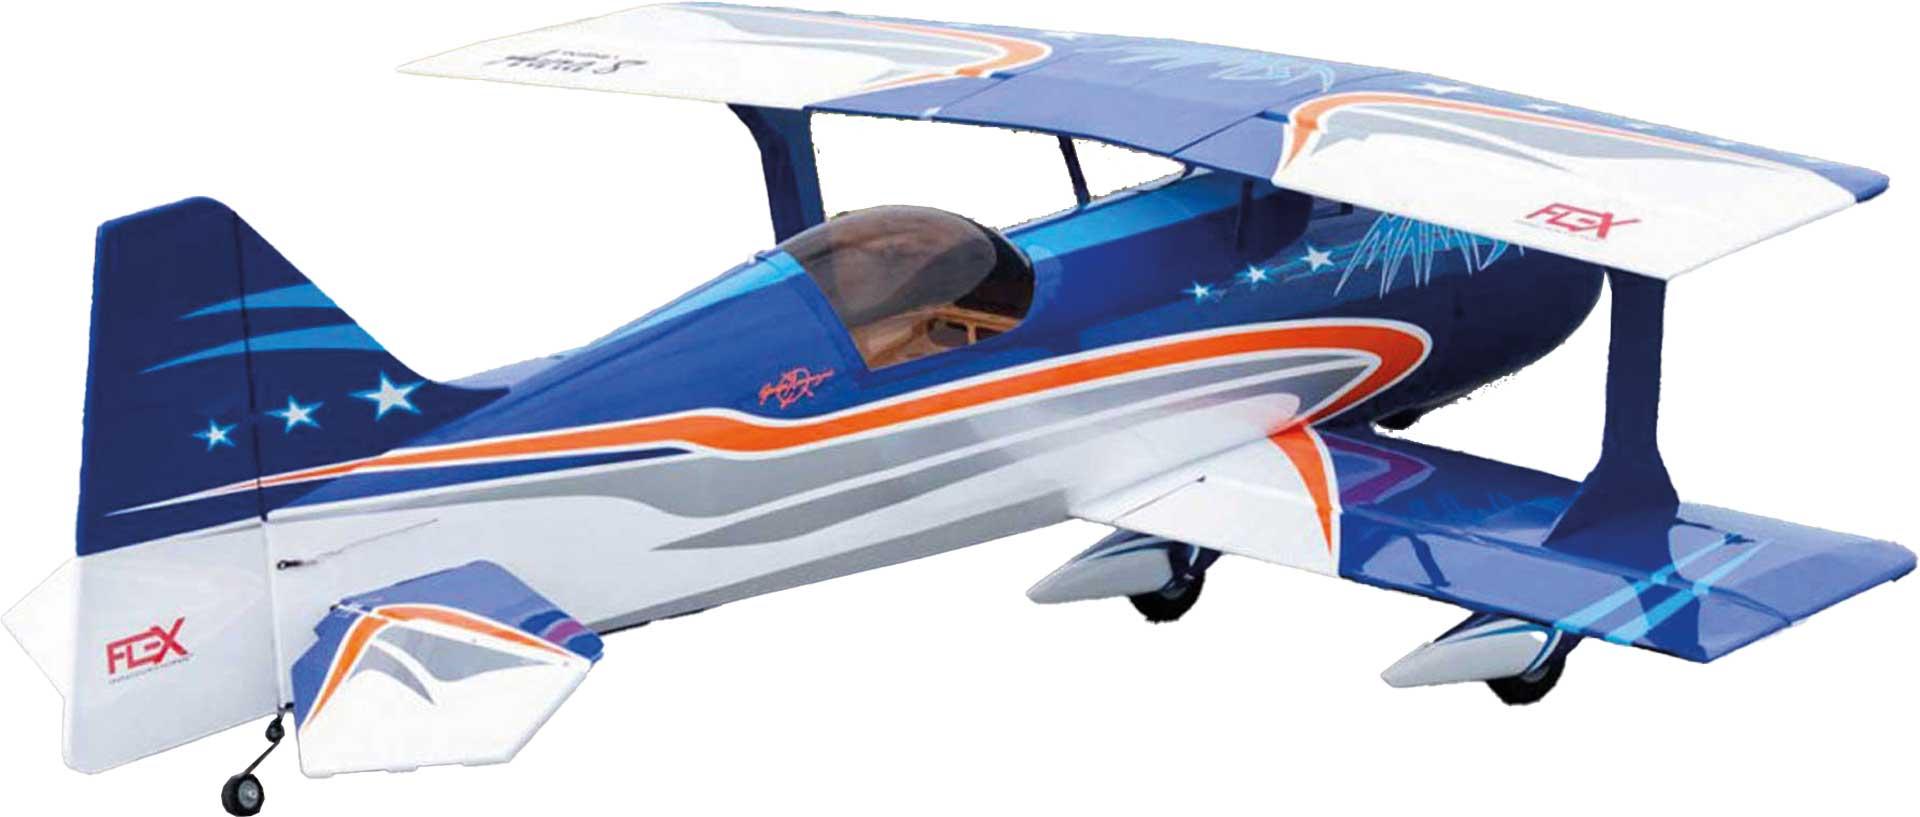 PREMIER AIRCRAFT MAMBA 70CC ARF DOUBLE DECKER BLUE